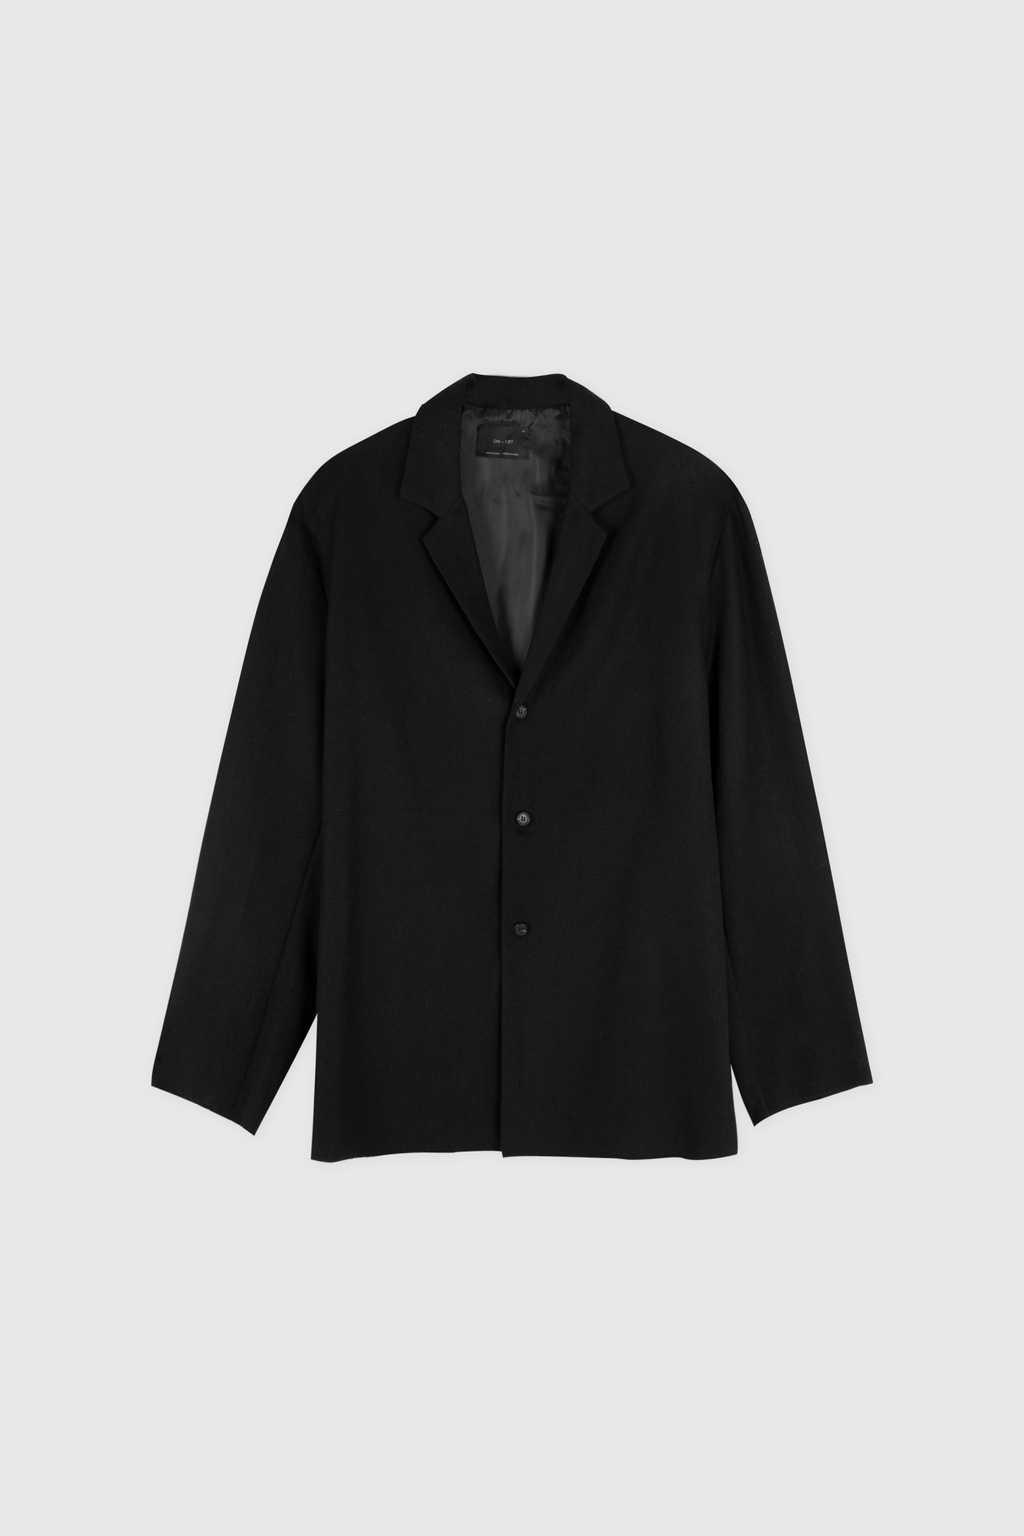 Jacket J002M Black 11